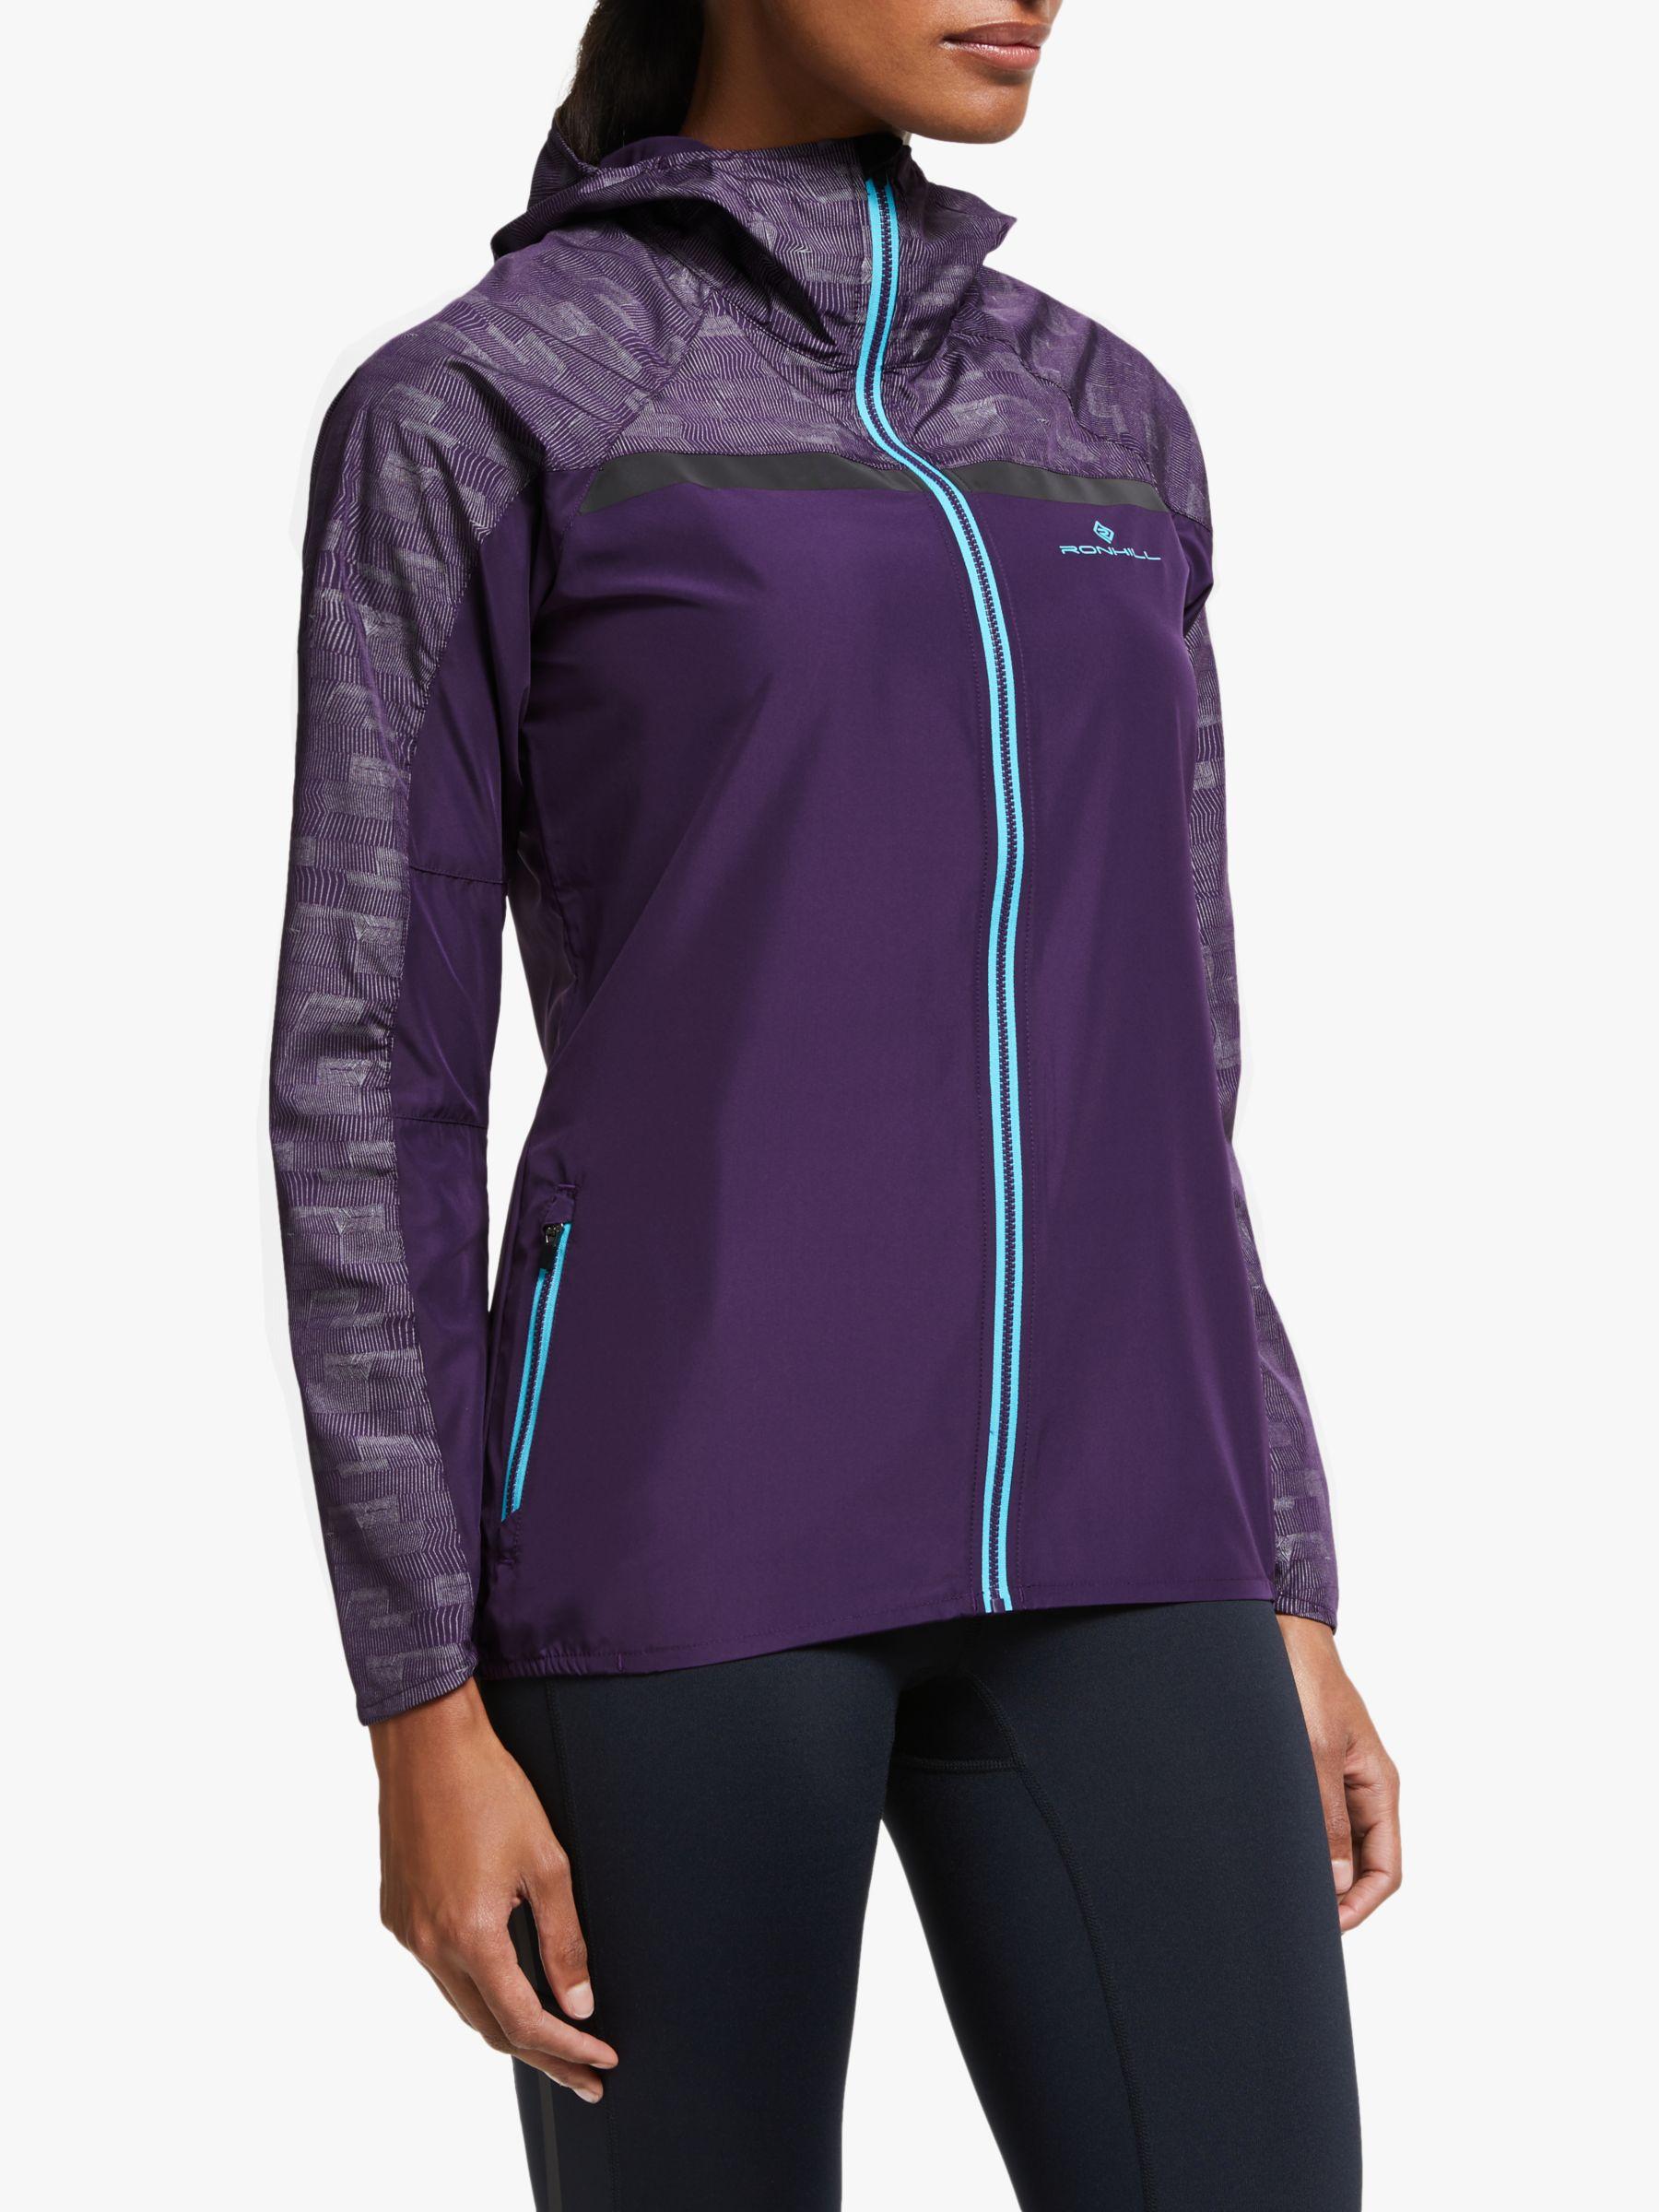 Asics Womens Running Jacket Full Zip Water /& Wind Resistant Coat Hi Viz Yellow